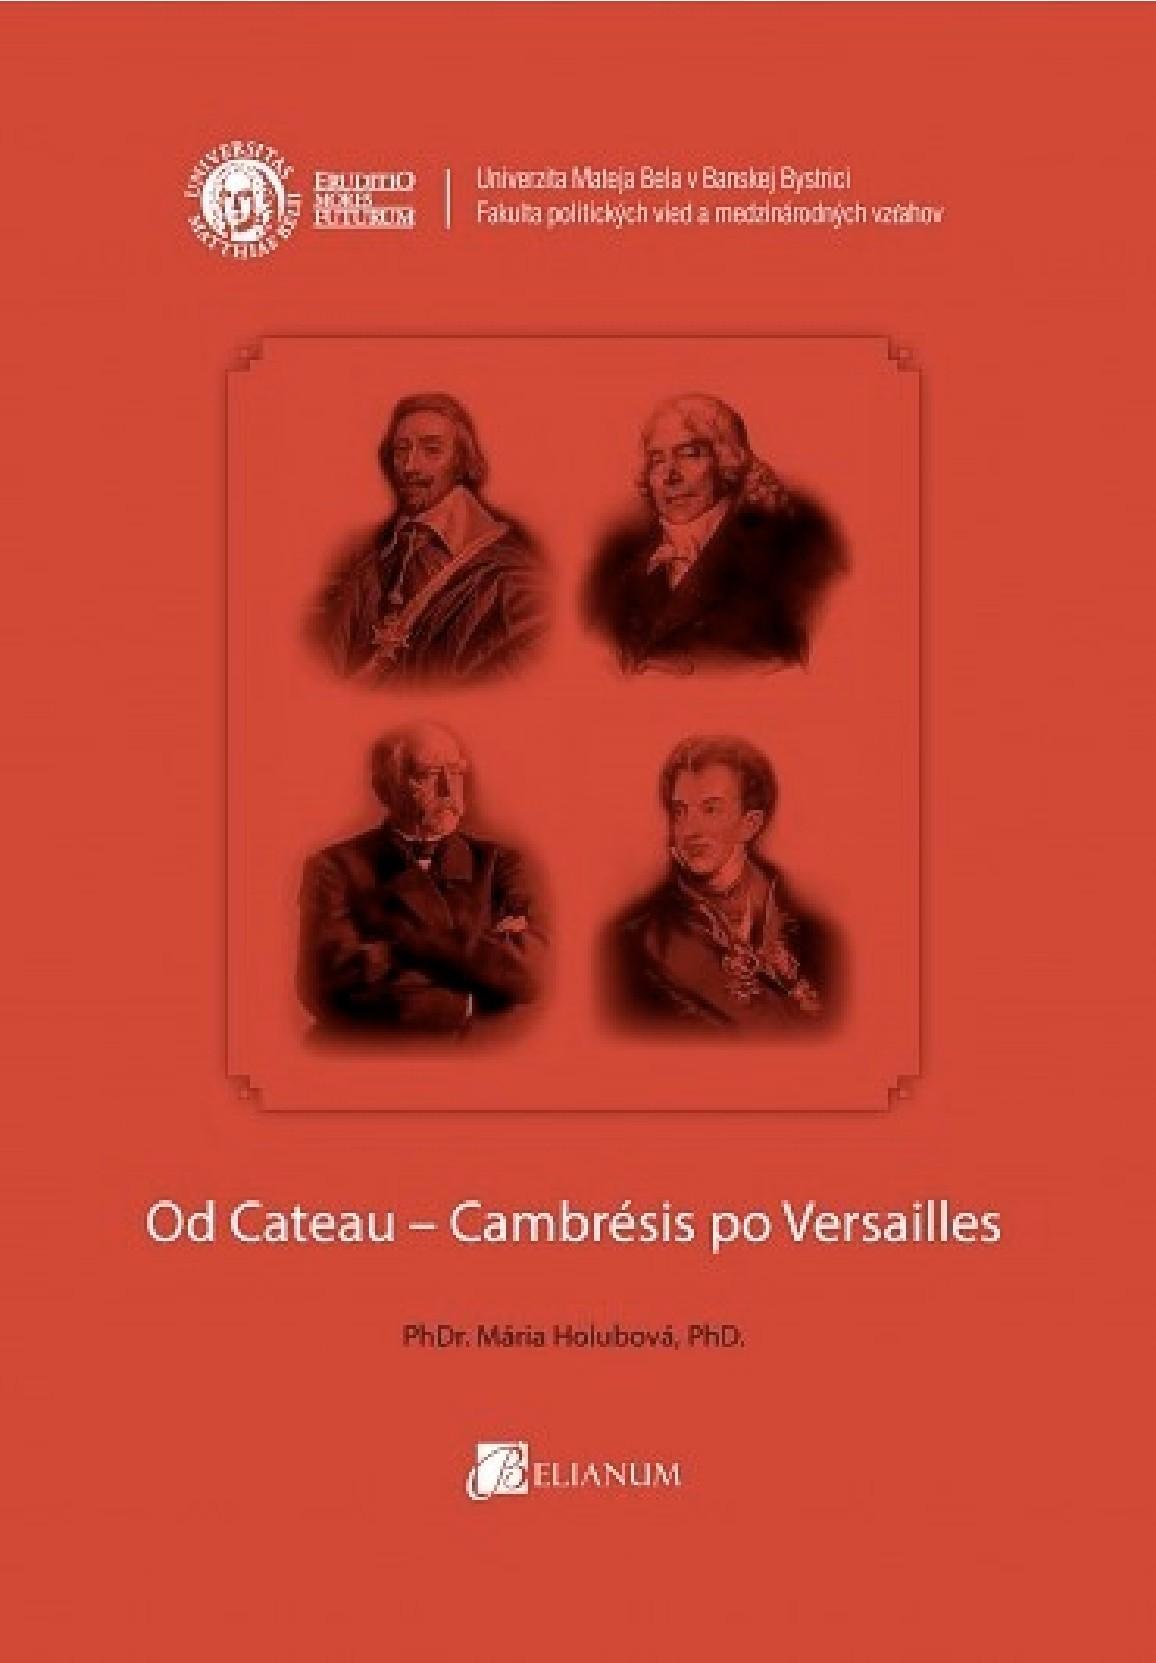 Od Cateau-Cambrésis po Versailles